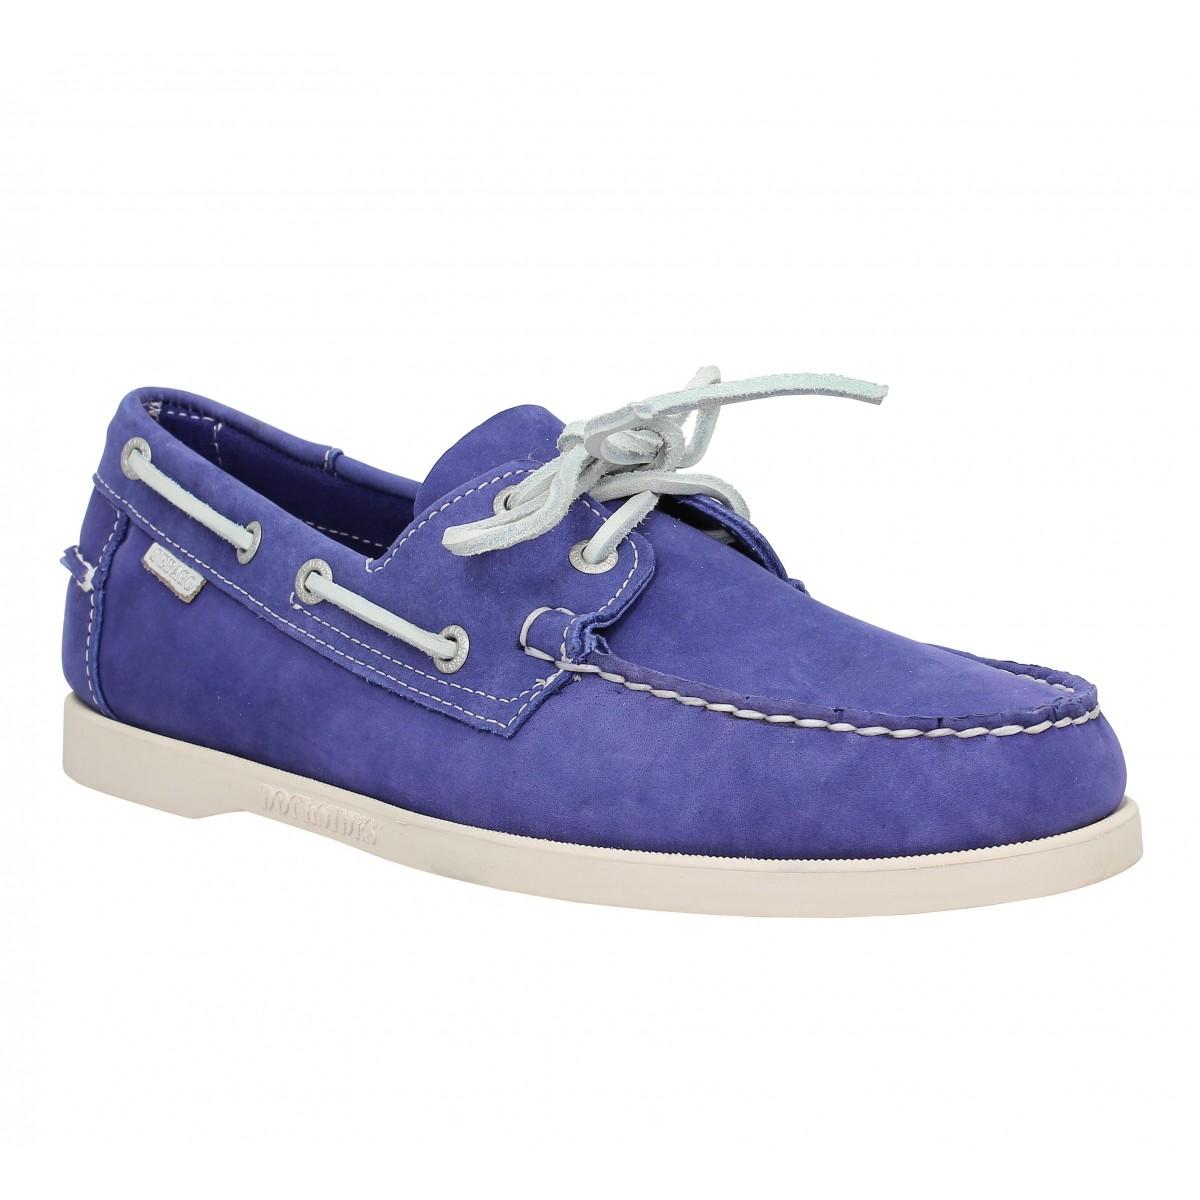 Chaussures bateaux SEBAGO Docksides velours Homme Bleu Violet